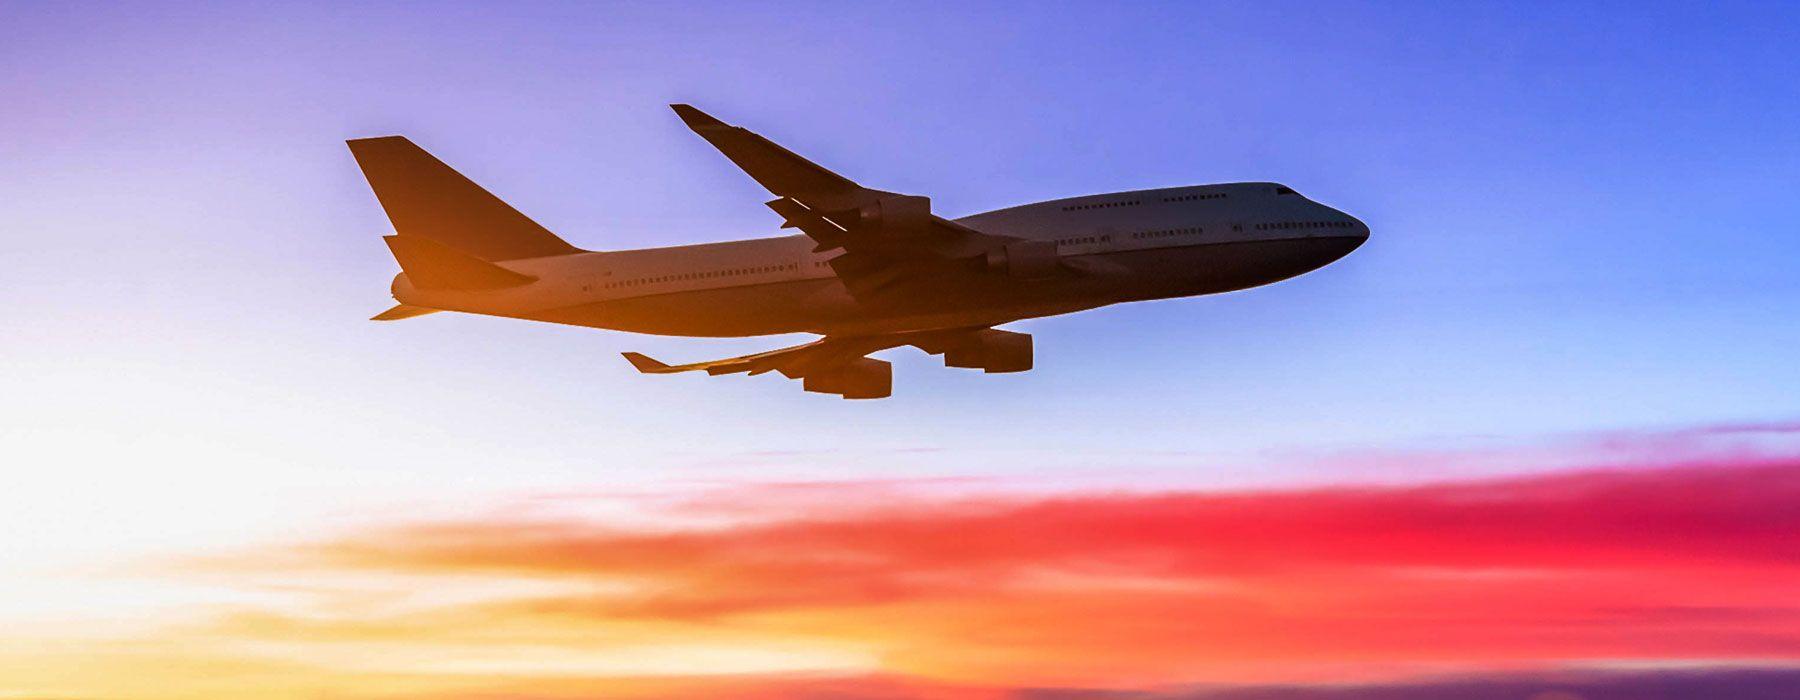 Cheap Last Minute Flights >> Cheap Last Minute Flights Last Minute Travel Deals Cheap